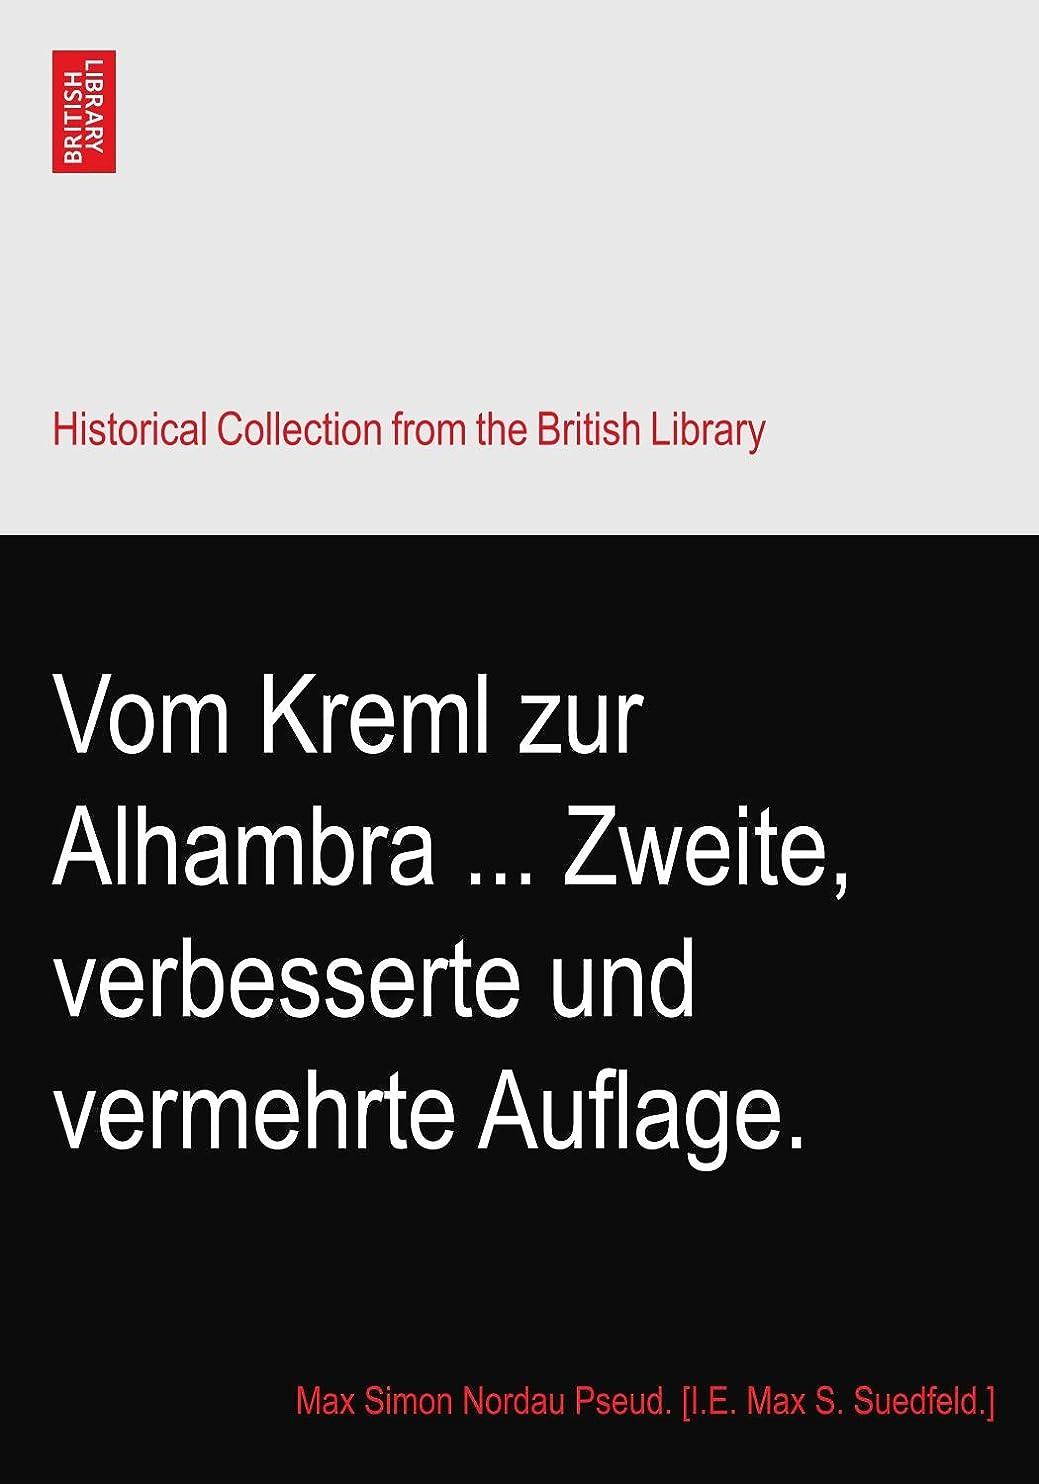 おめでとうパステルテセウスVom Kreml zur Alhambra ... Zweite, verbesserte und vermehrte Auflage.